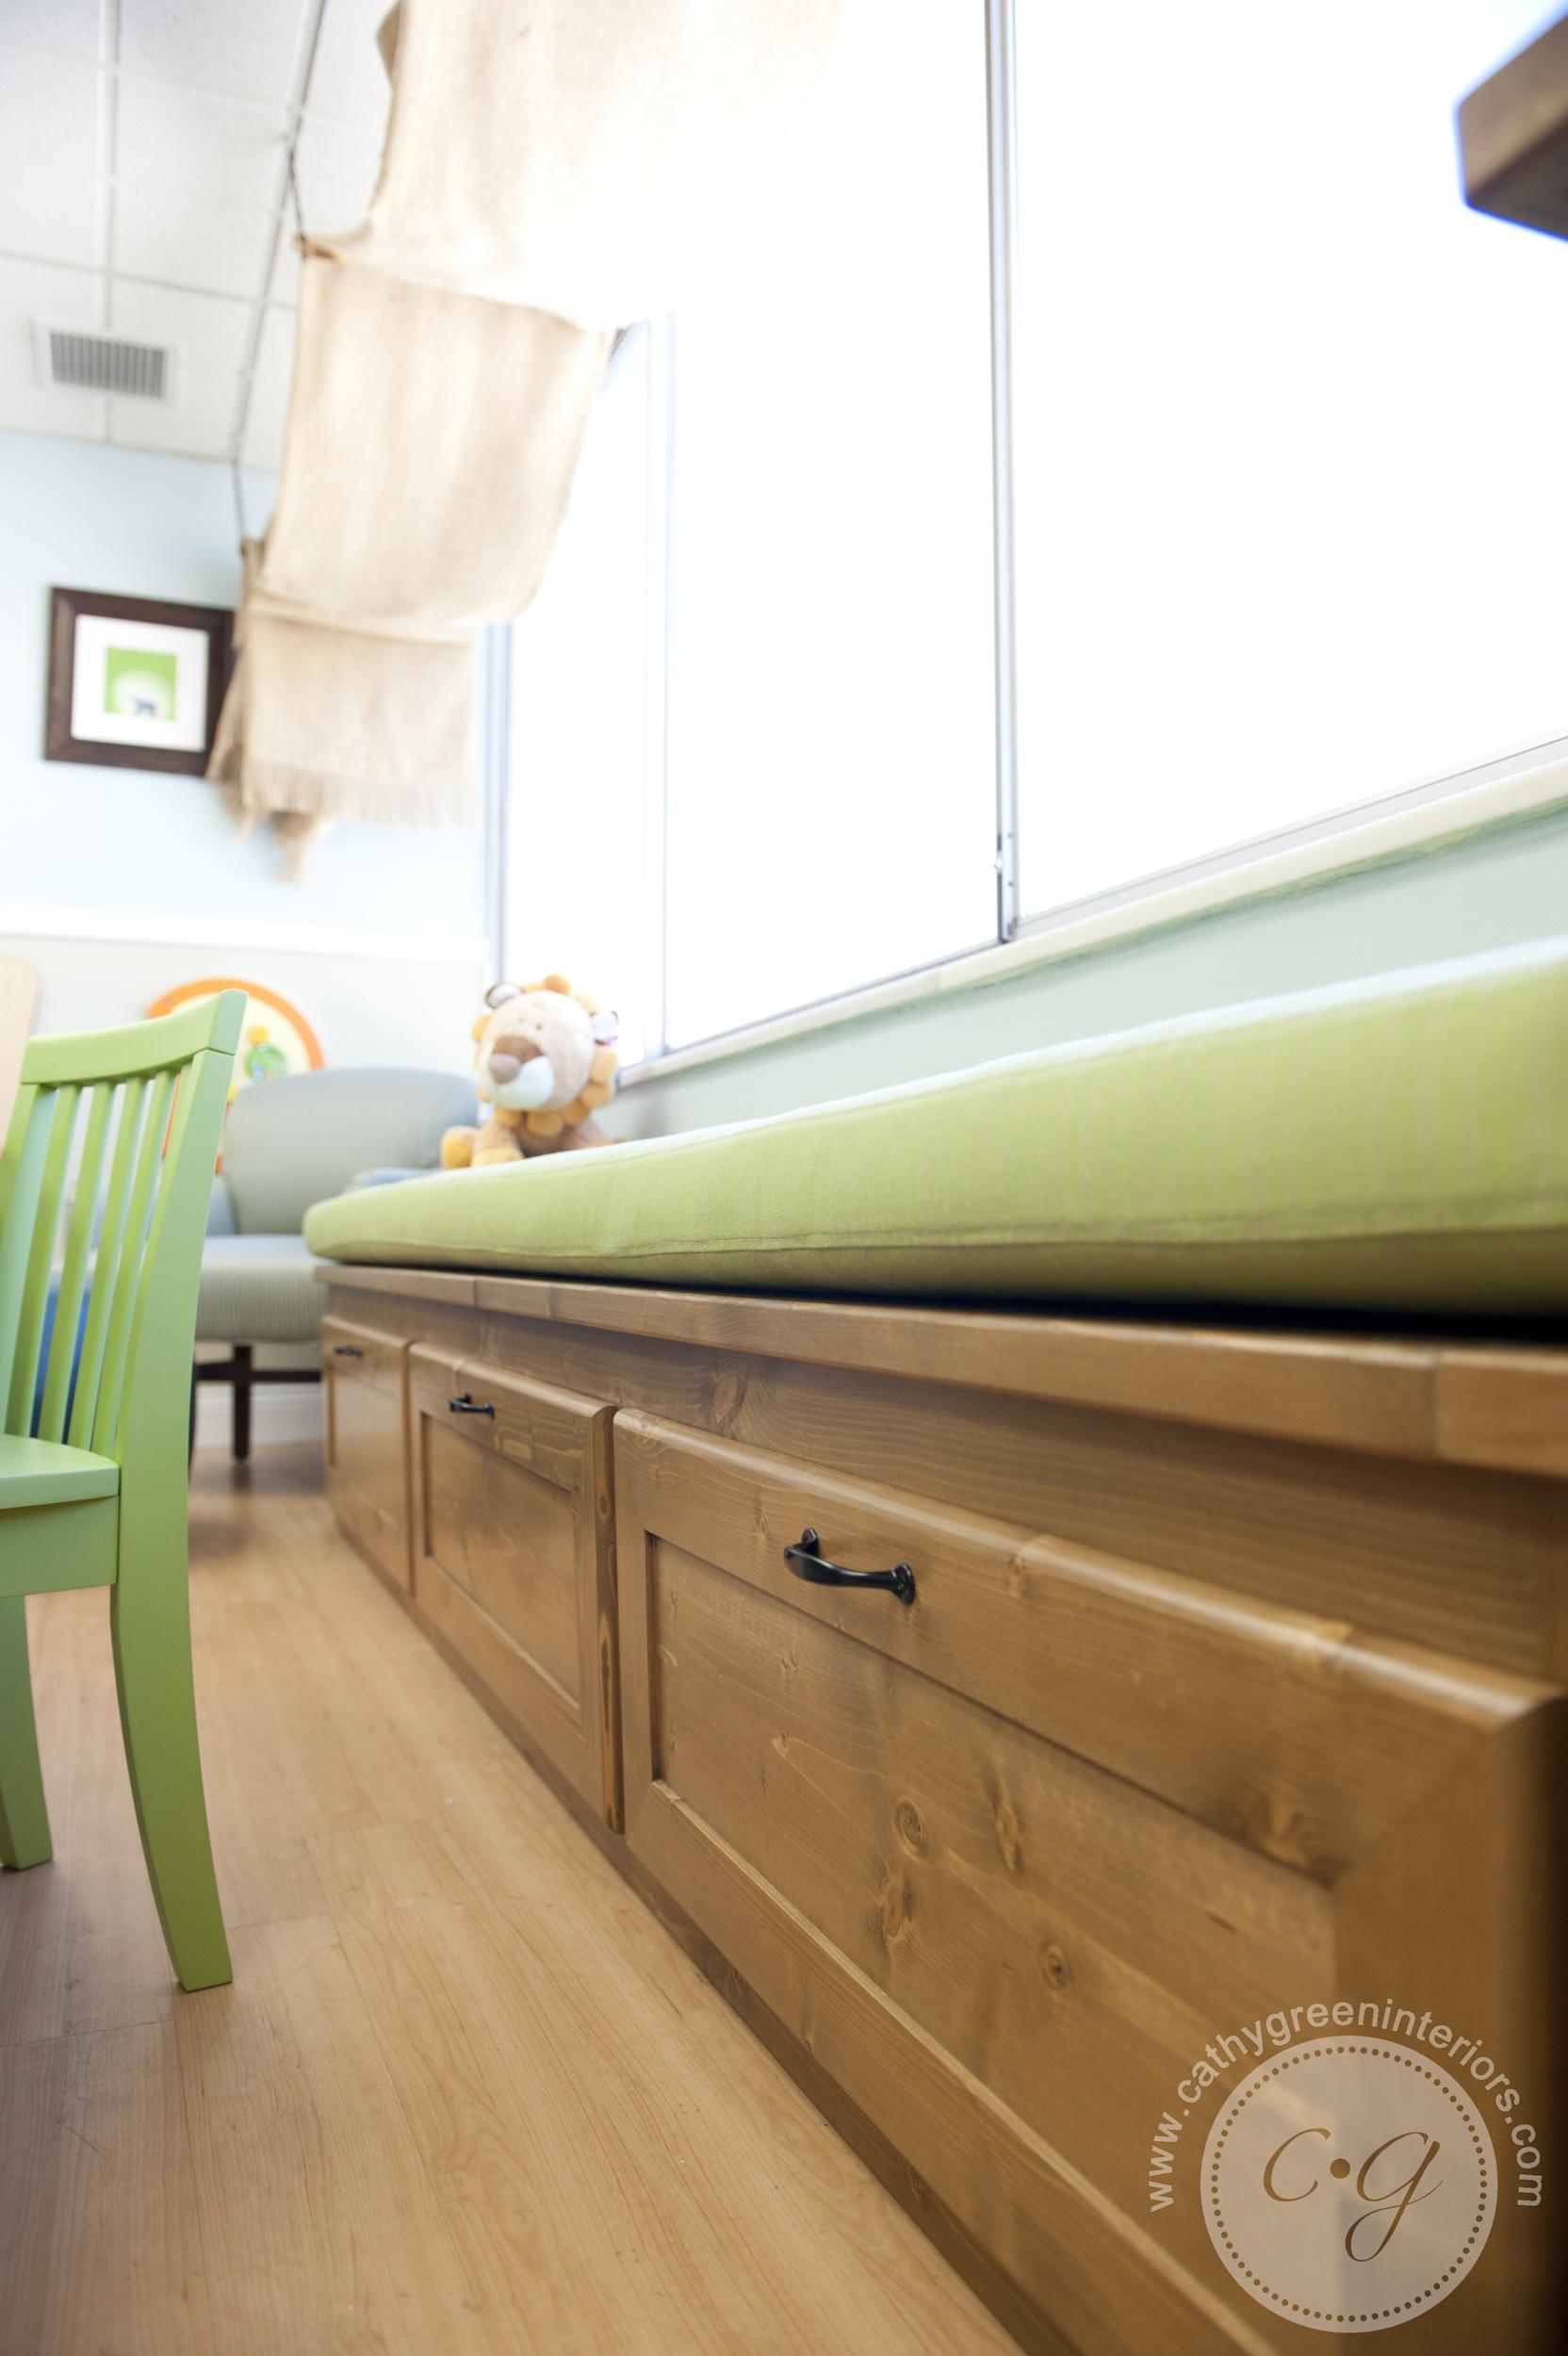 Chippenham Hospital Playroom window bench - Richmond, VA